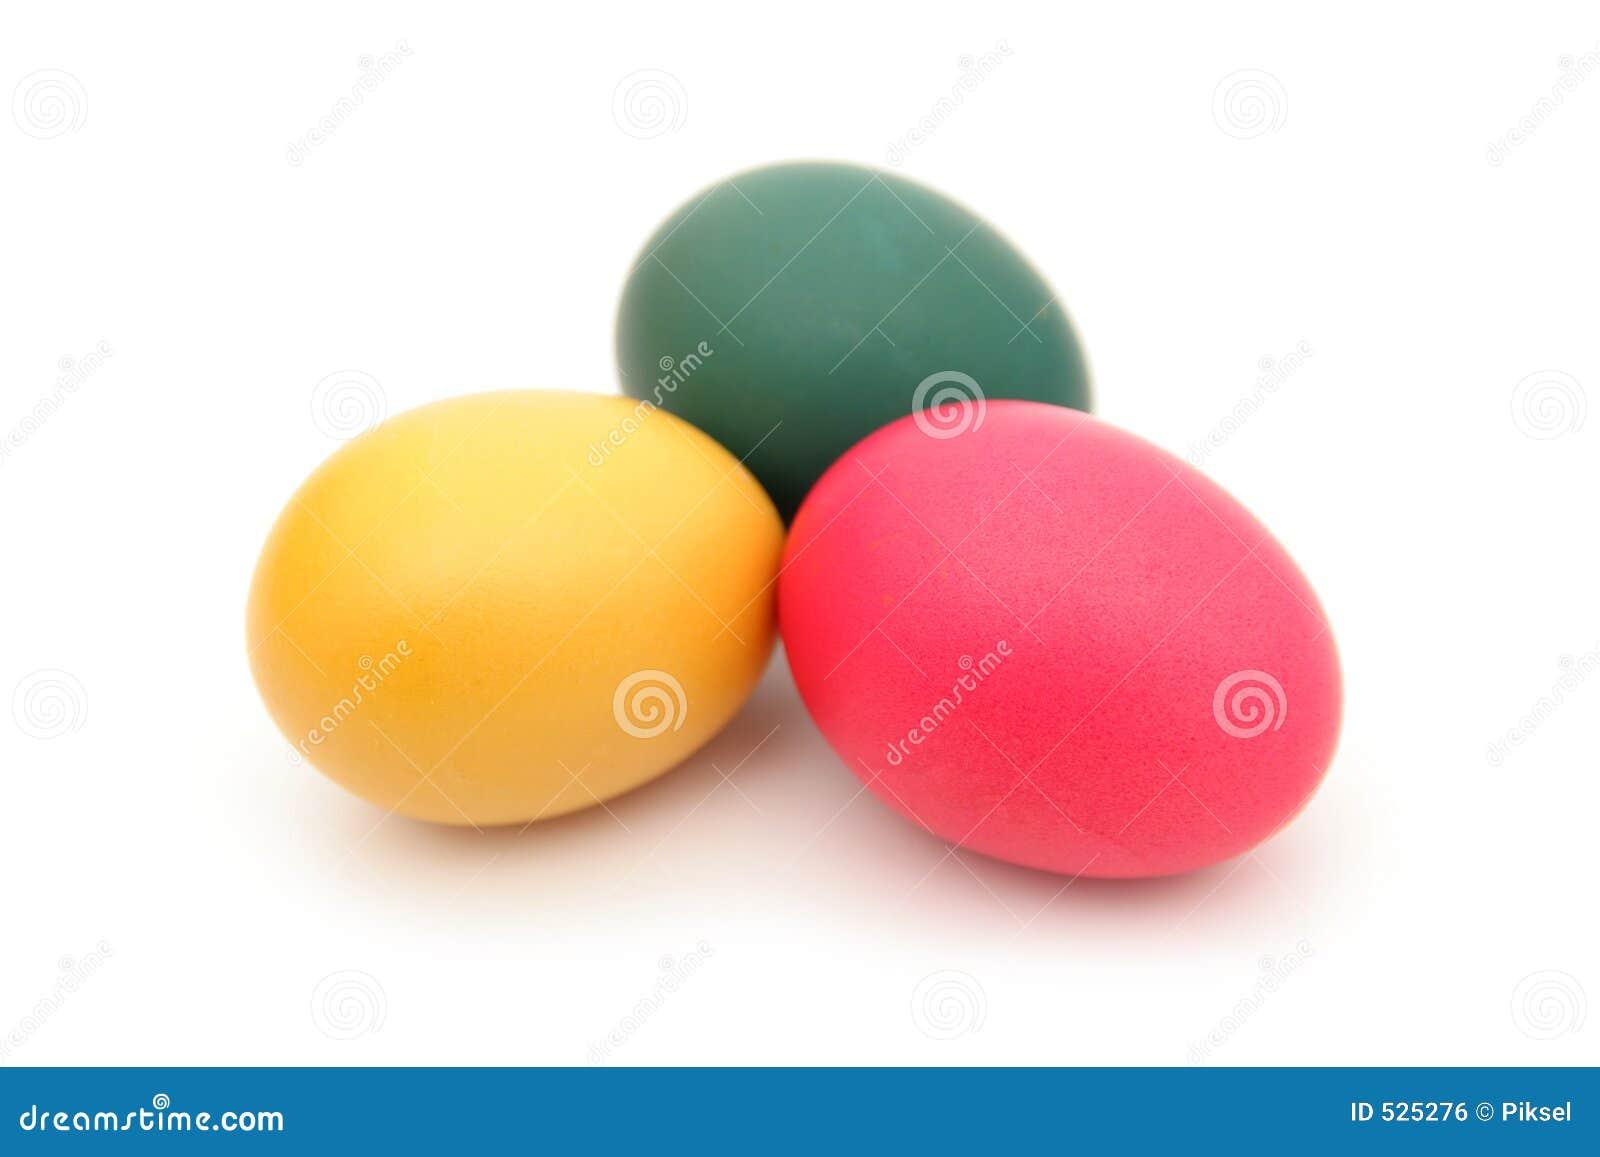 Download 复活节彩蛋 库存照片. 图片 包括有 鸡蛋, 庆祝, 复活节, 装饰, 上色, 食物, 黄色, 颜色, 粉红色 - 525276